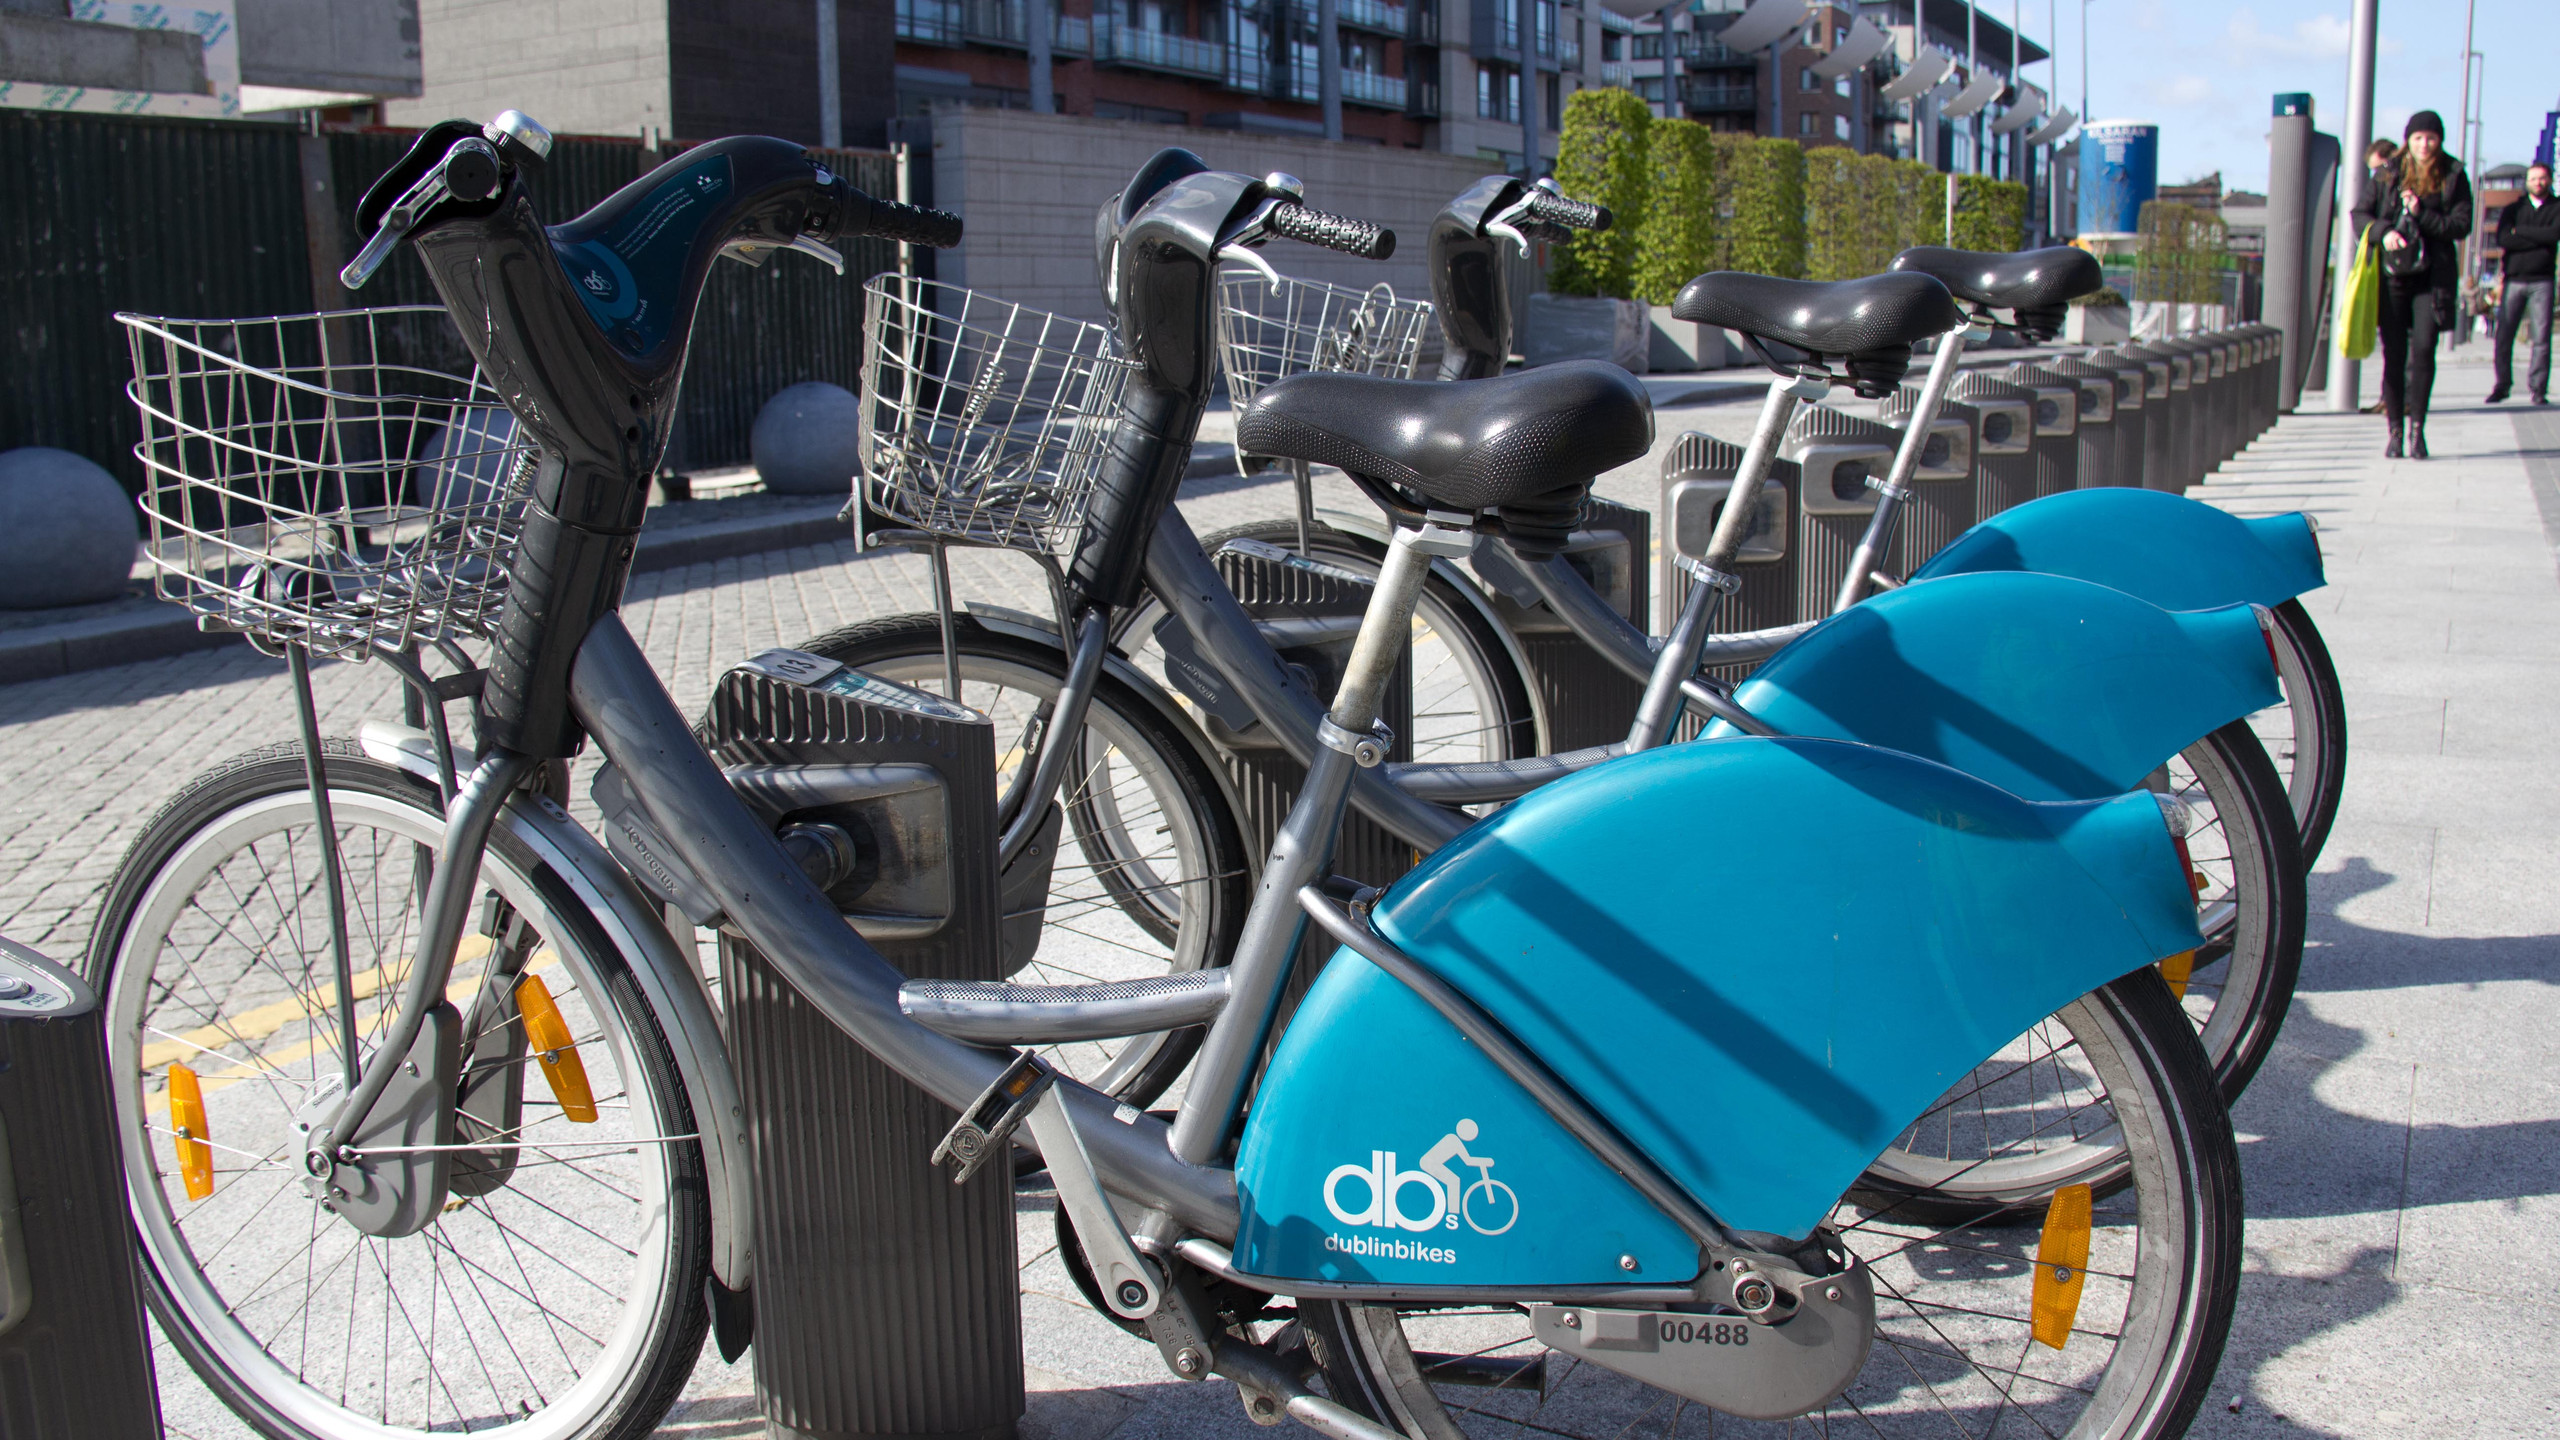 Dublin Bikes Station